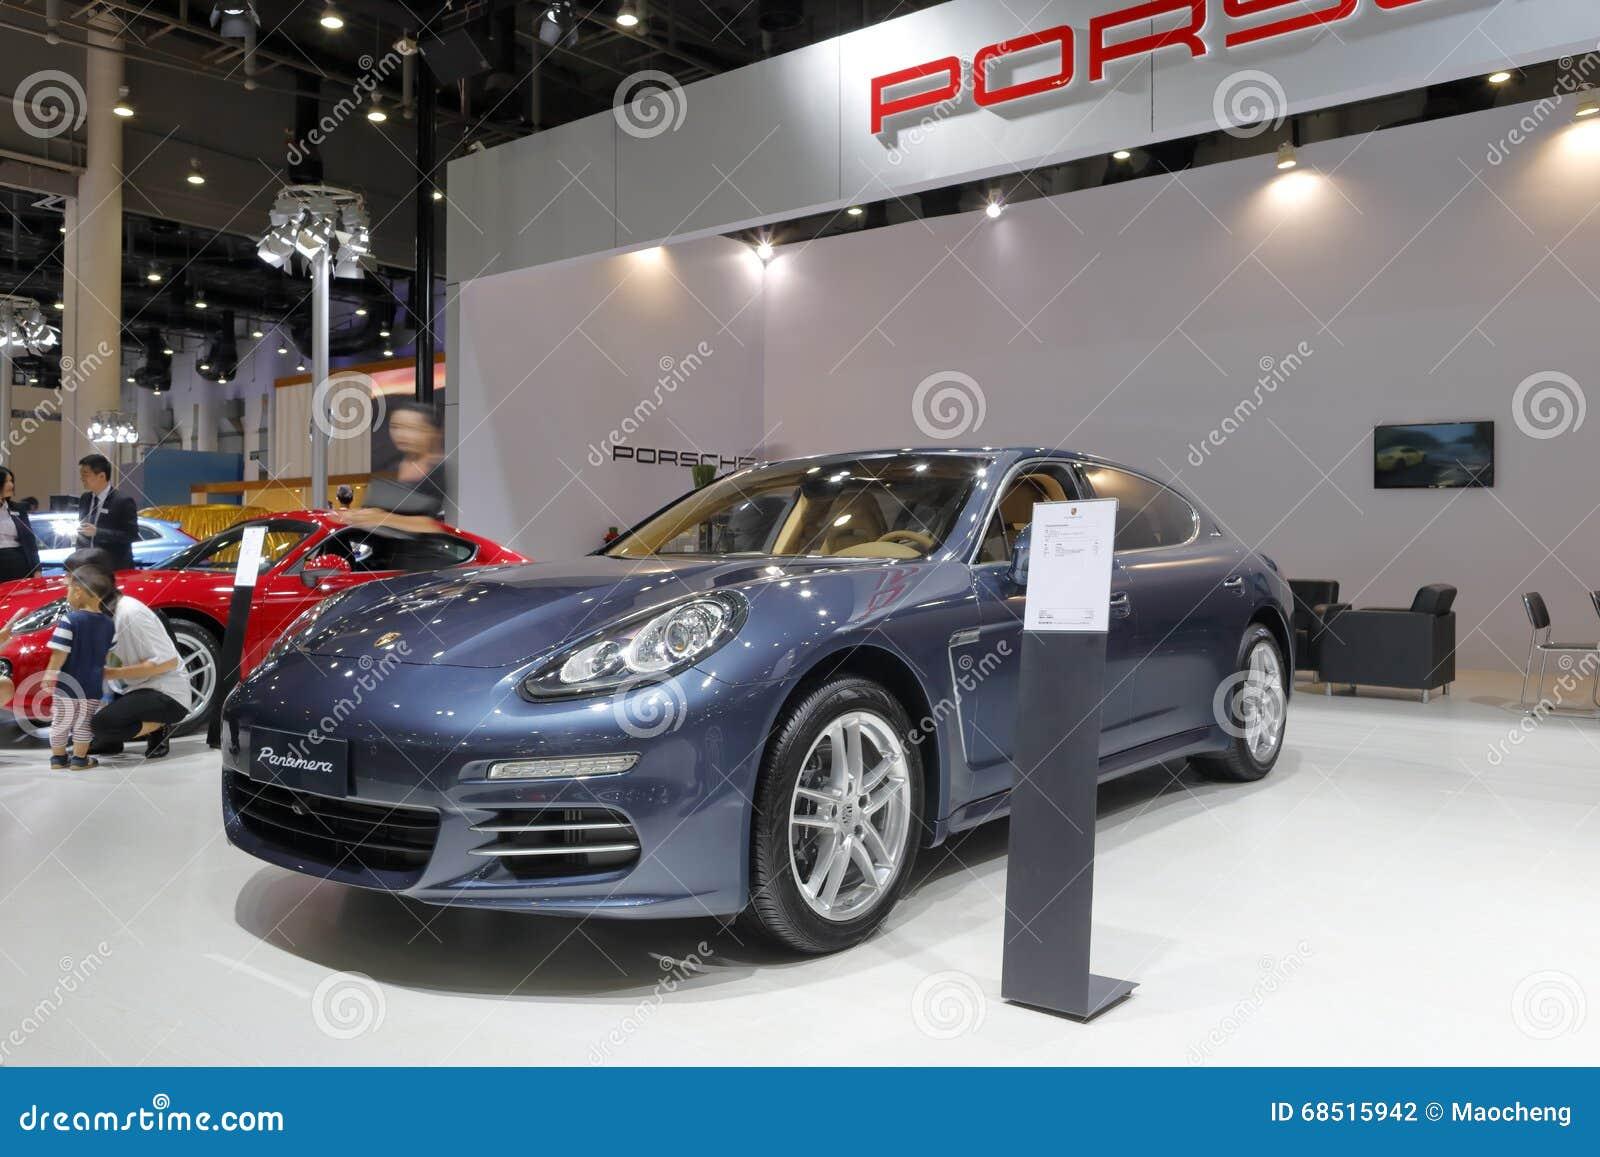 Porsche Booth Editorial Photography Image Of Dull Sedan